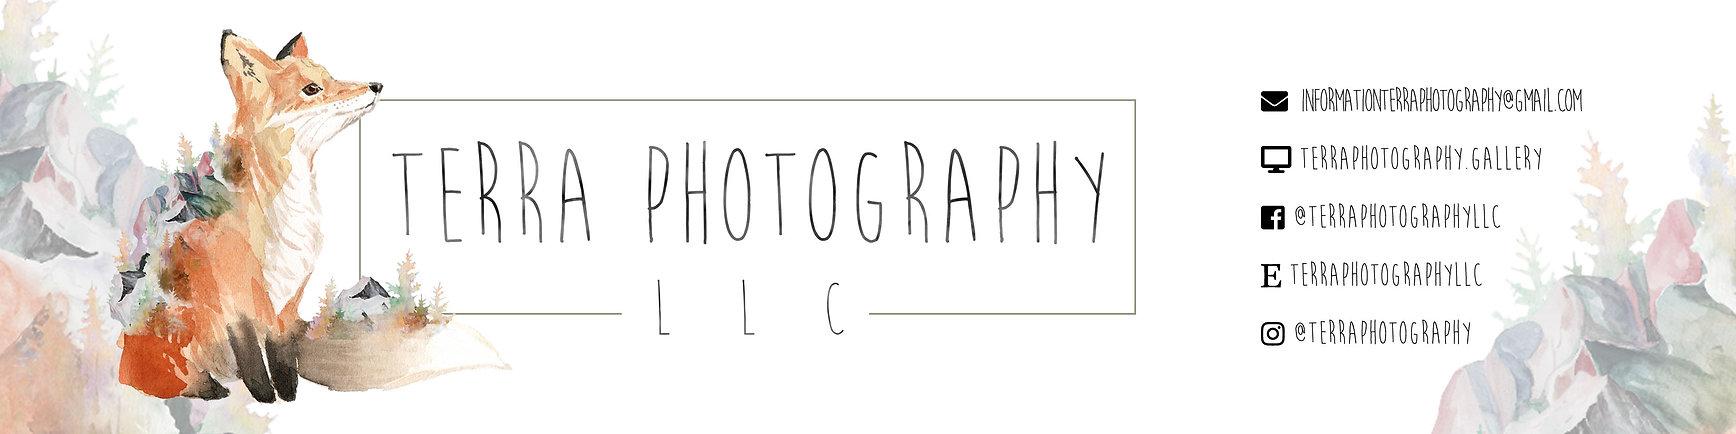 terraphotographyllc